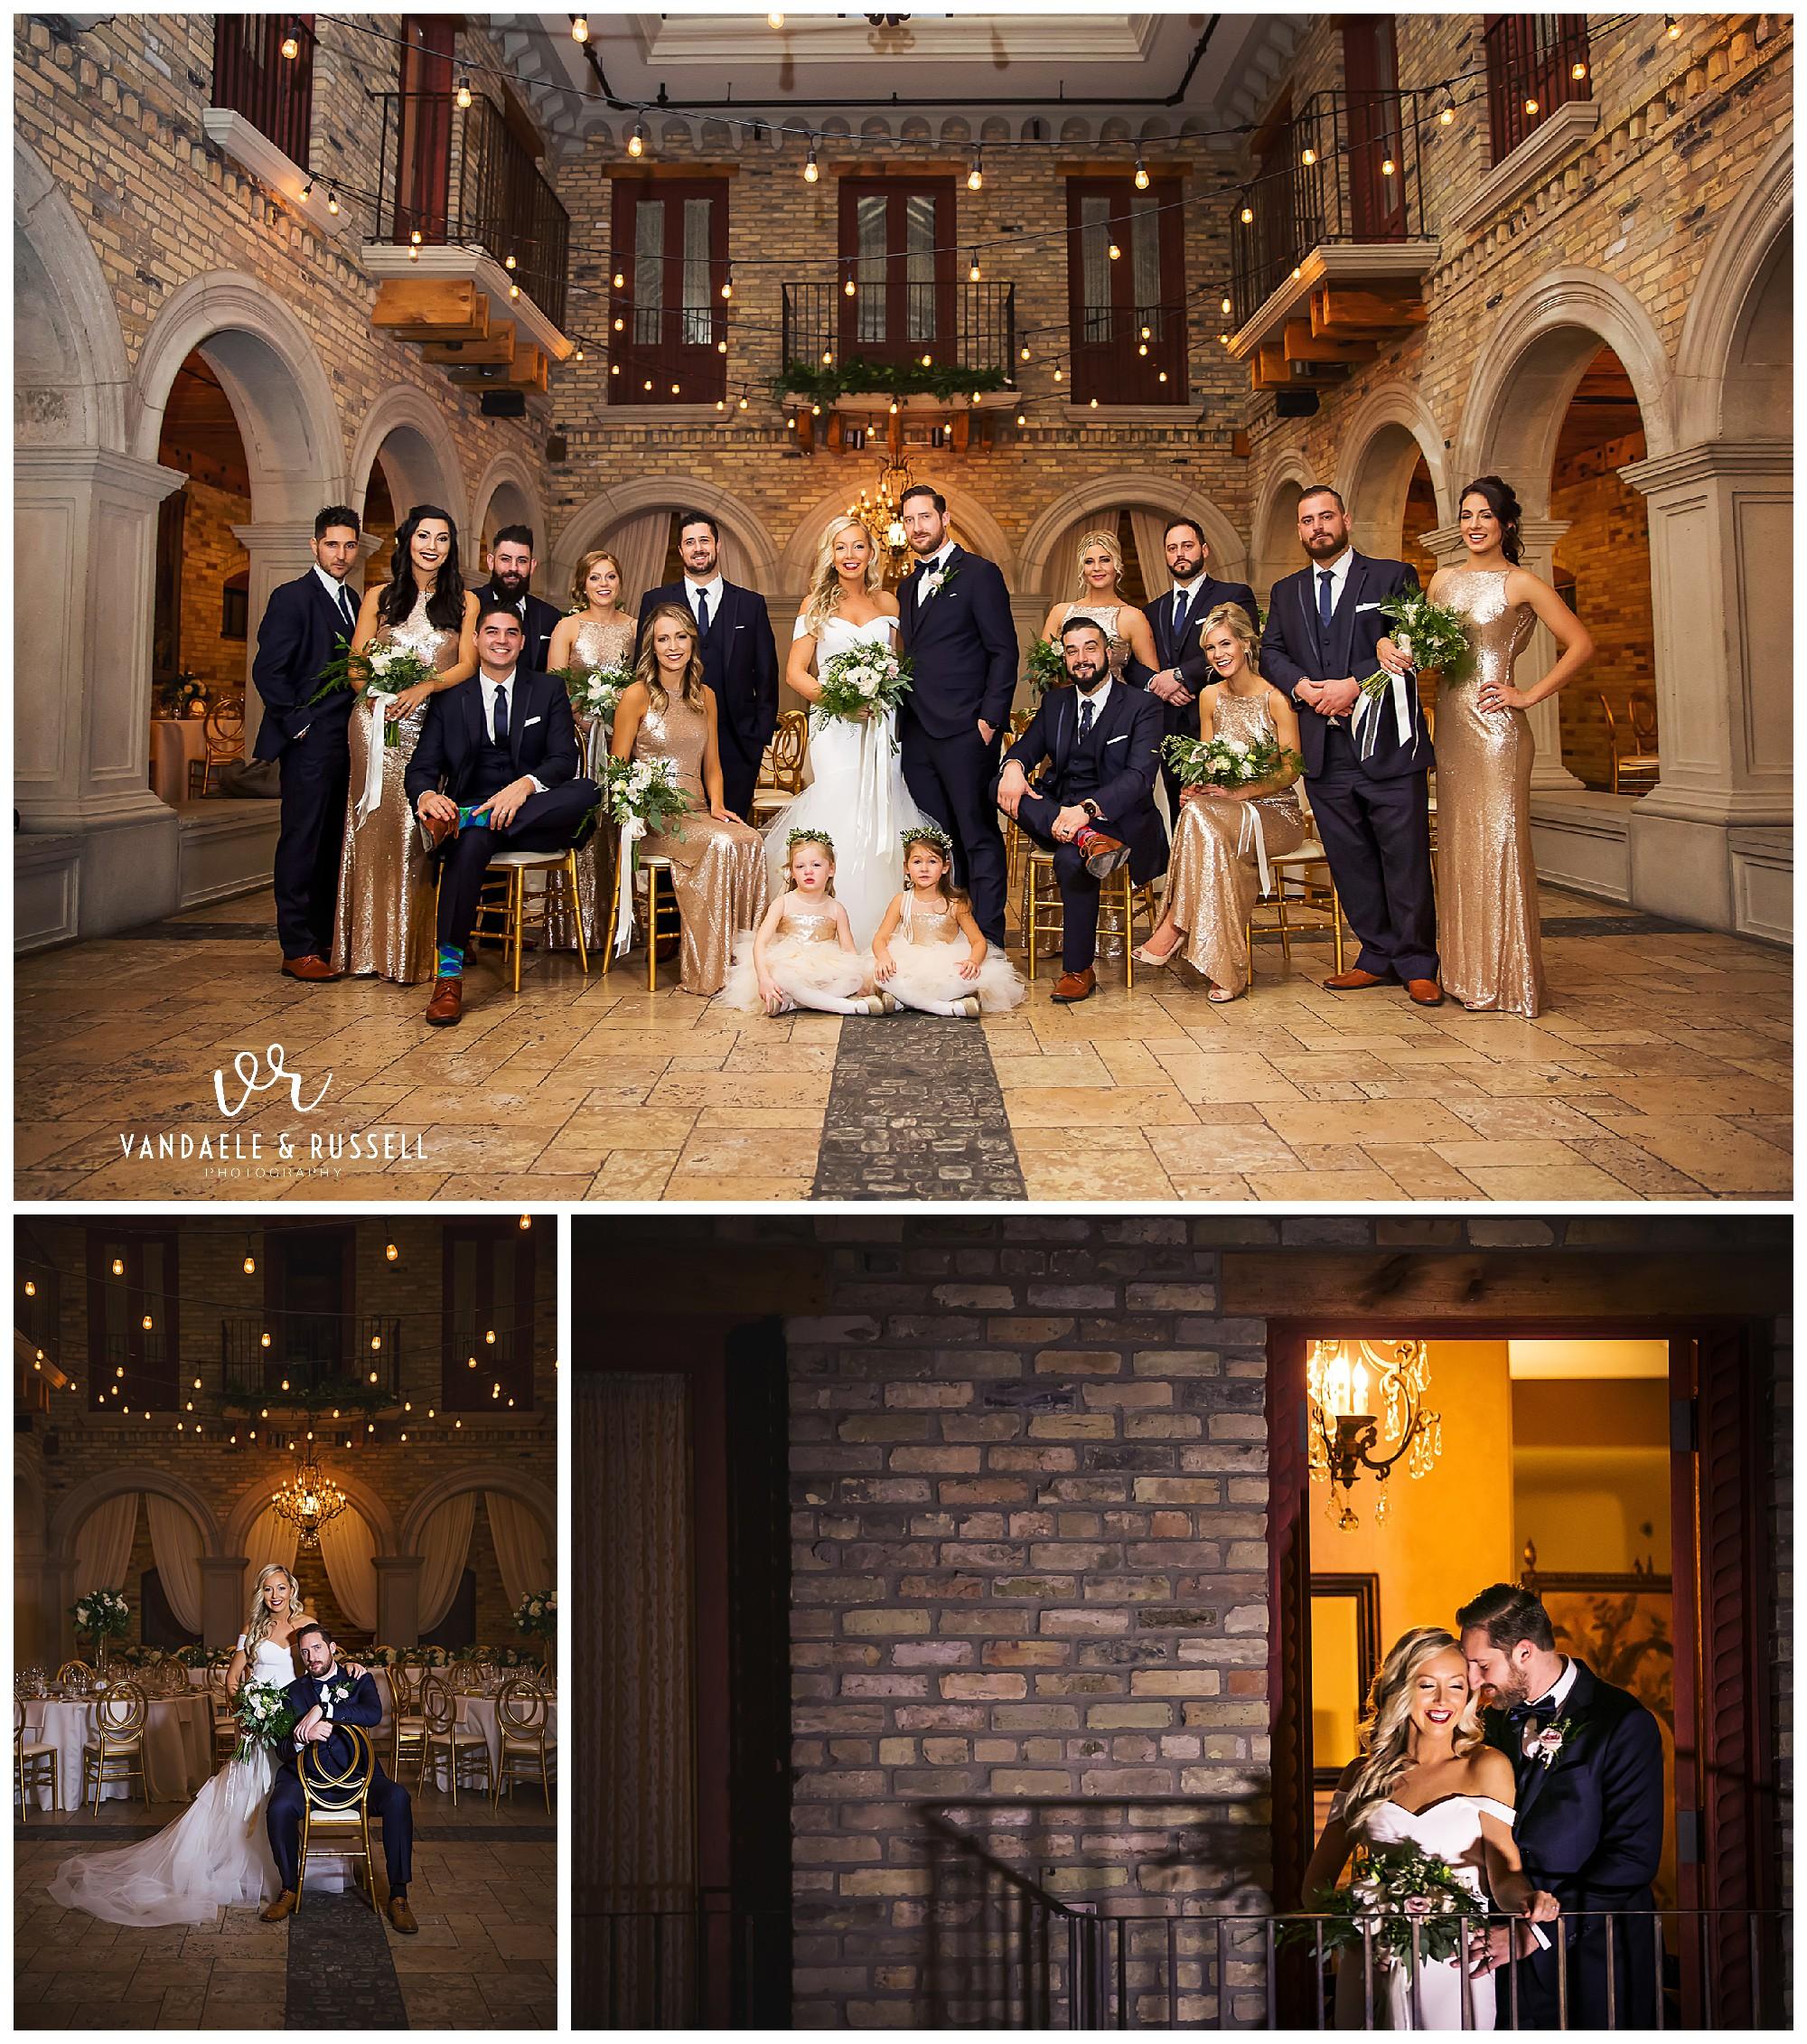 Hacienda-Sarria-Wedding-Photos-NYE-Michelle-Matt-VanDaele-Russell_0011.jpg